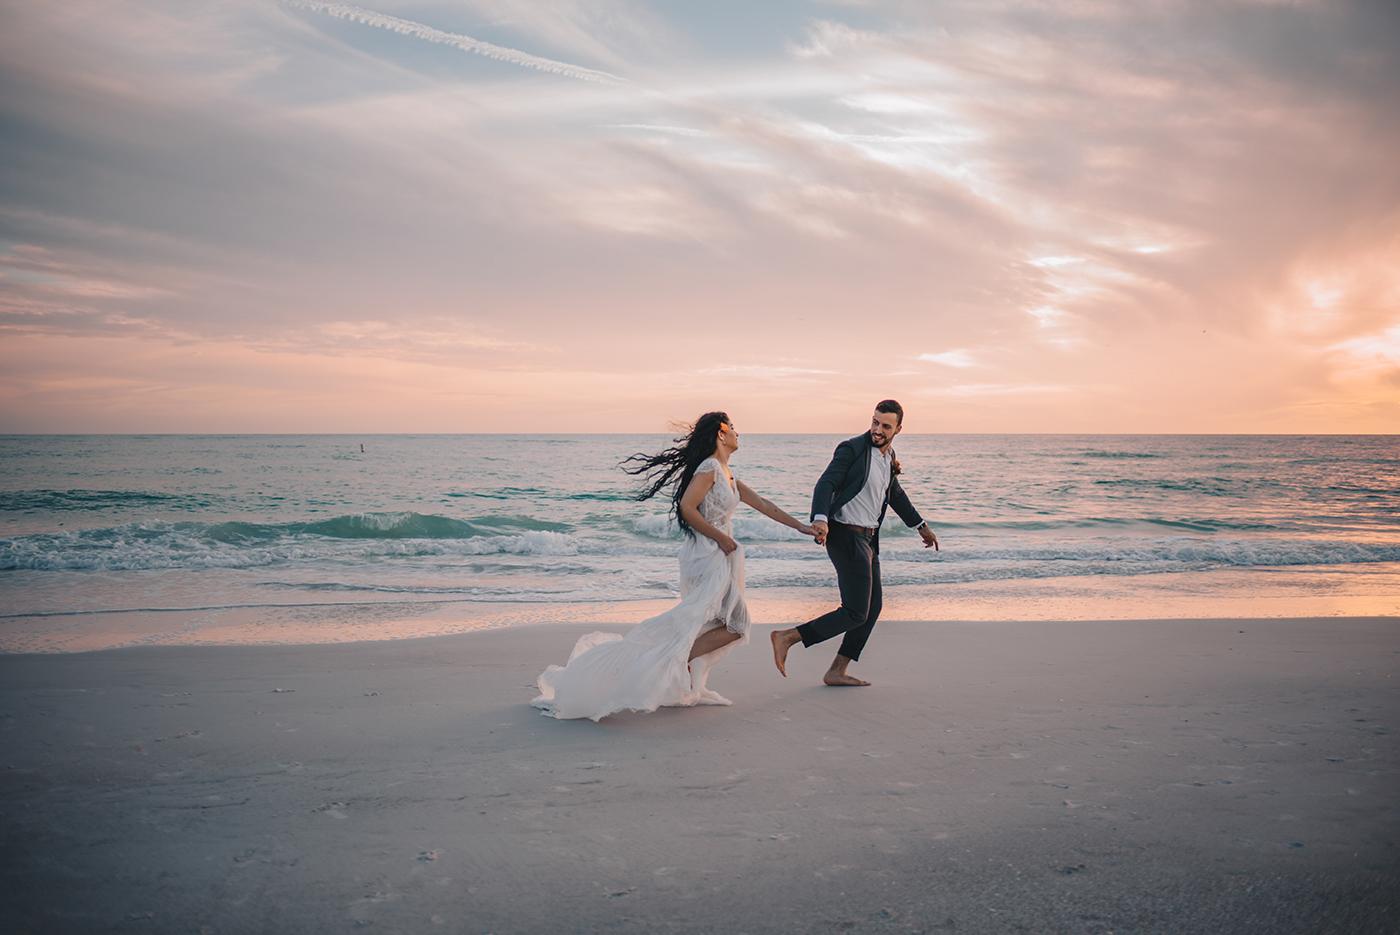 Los-Vargas-Photo-Moana-Wedding-Style-shoot-102.jpg